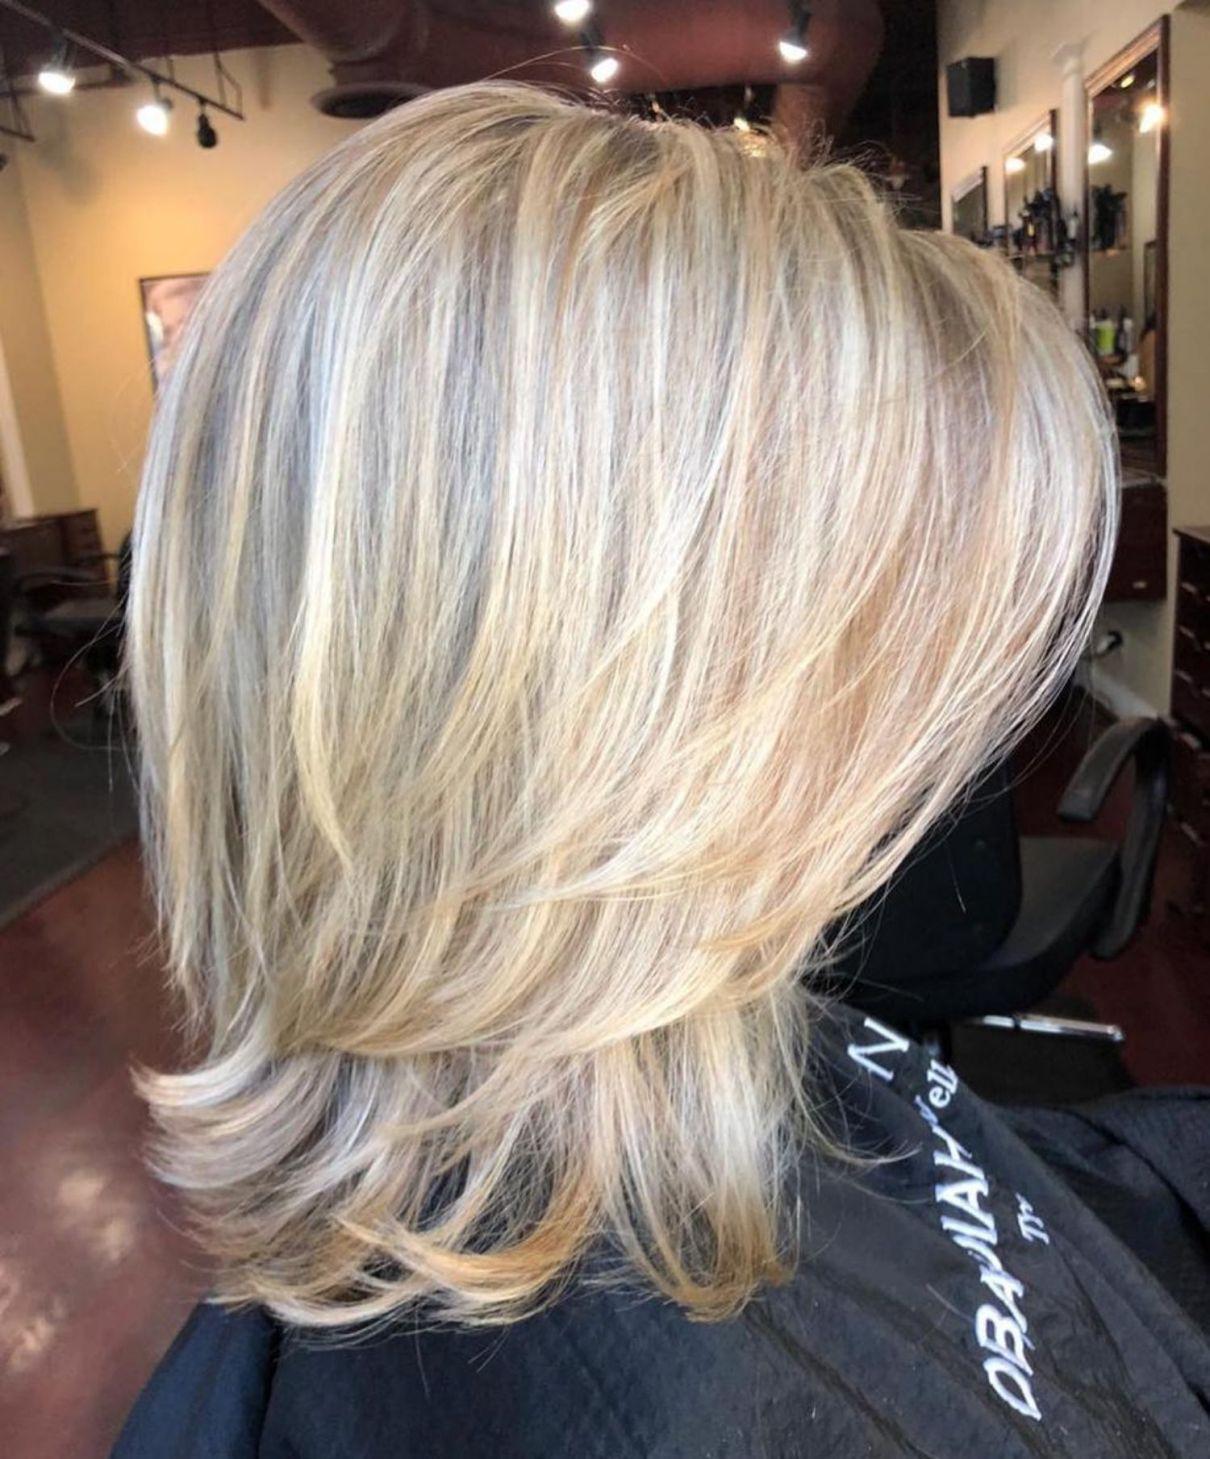 Above The Shoulder Feathered Blonde Haircut Kapsels Halflange Kapsels Kapsel Halflang Fijn Haar